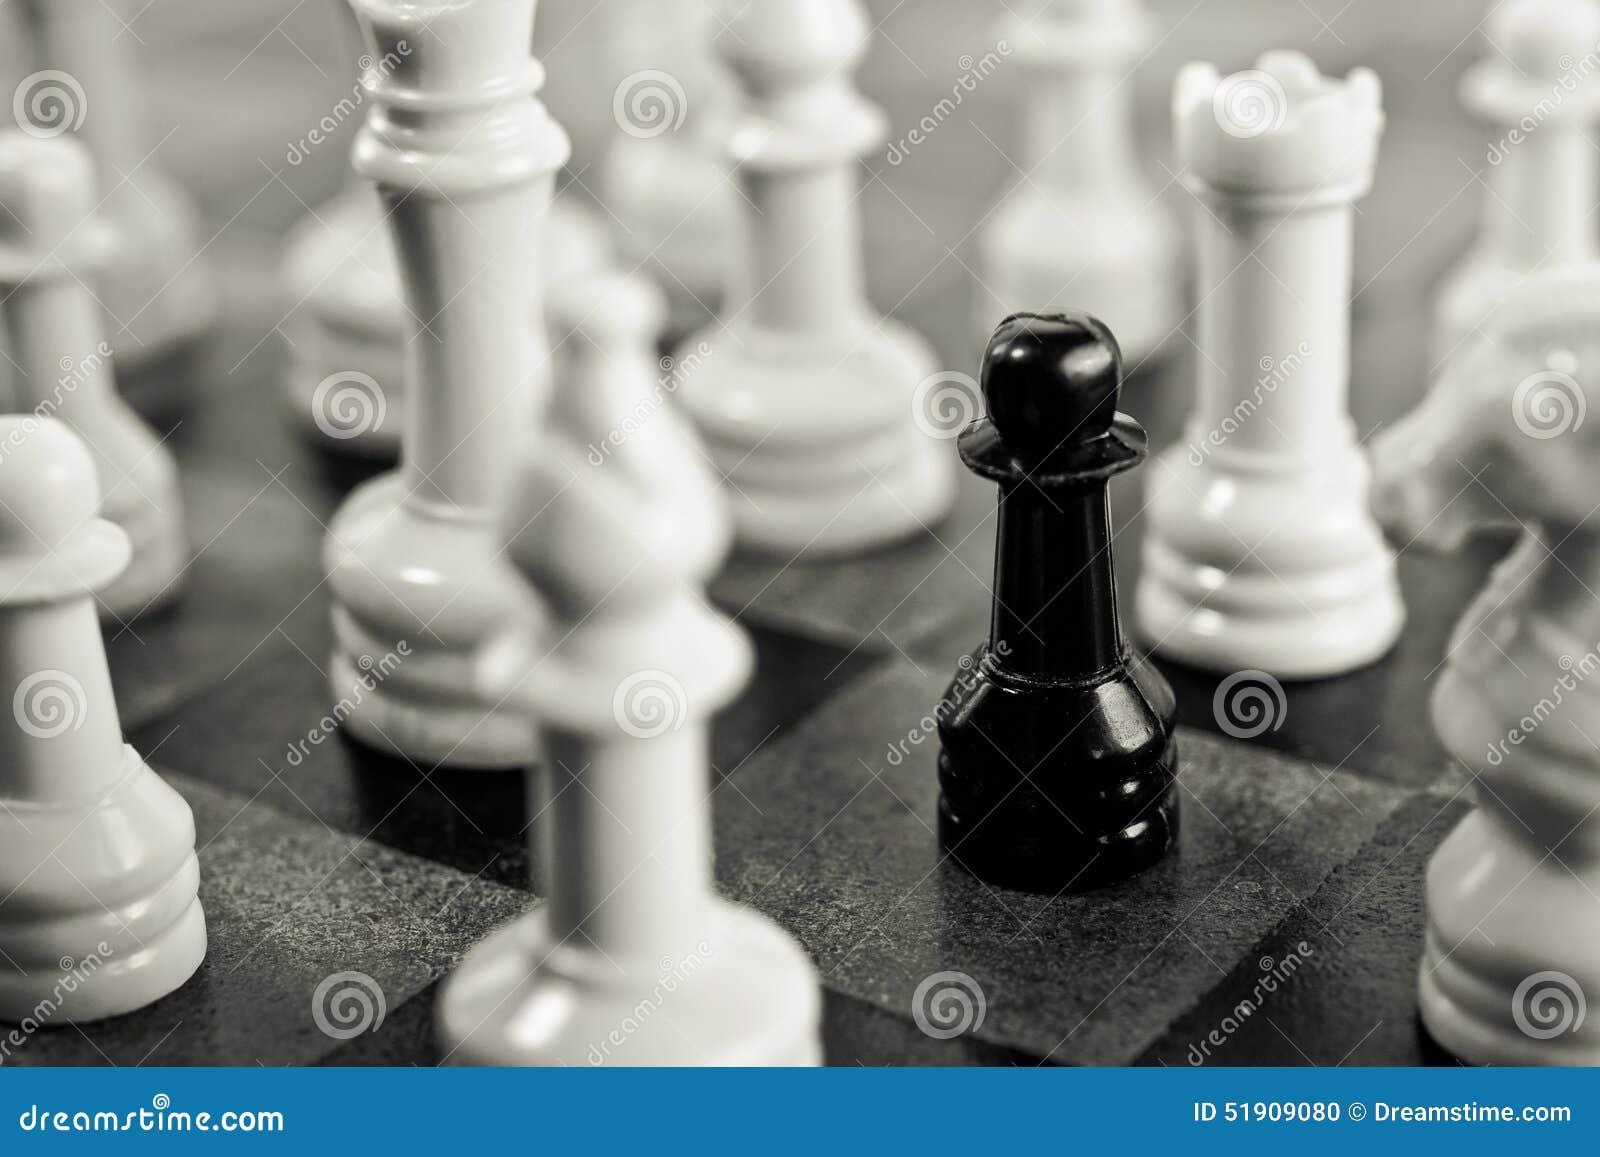 Black Pawn Trapped